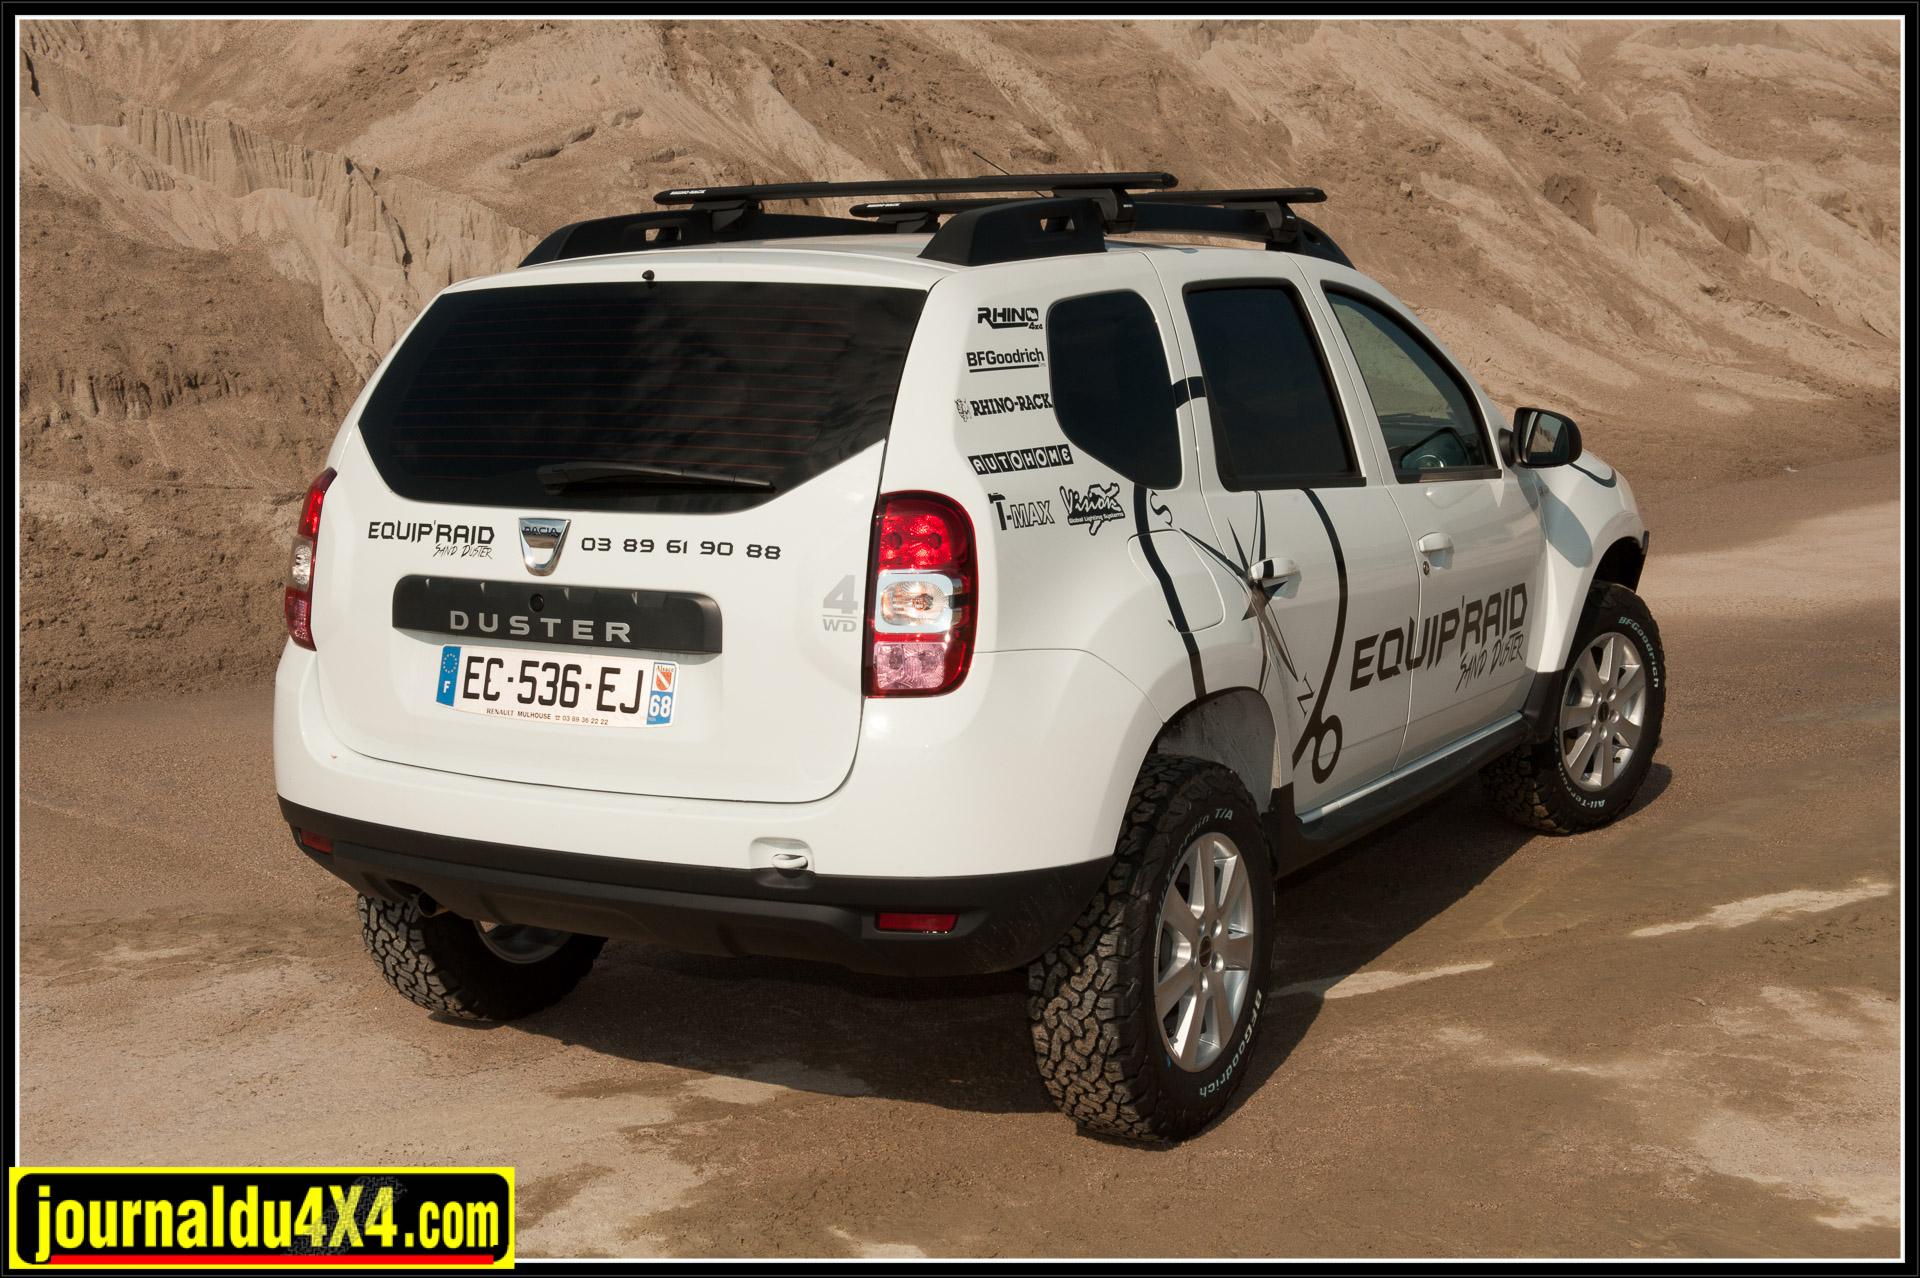 sand-duster-equipraid-10.jpg